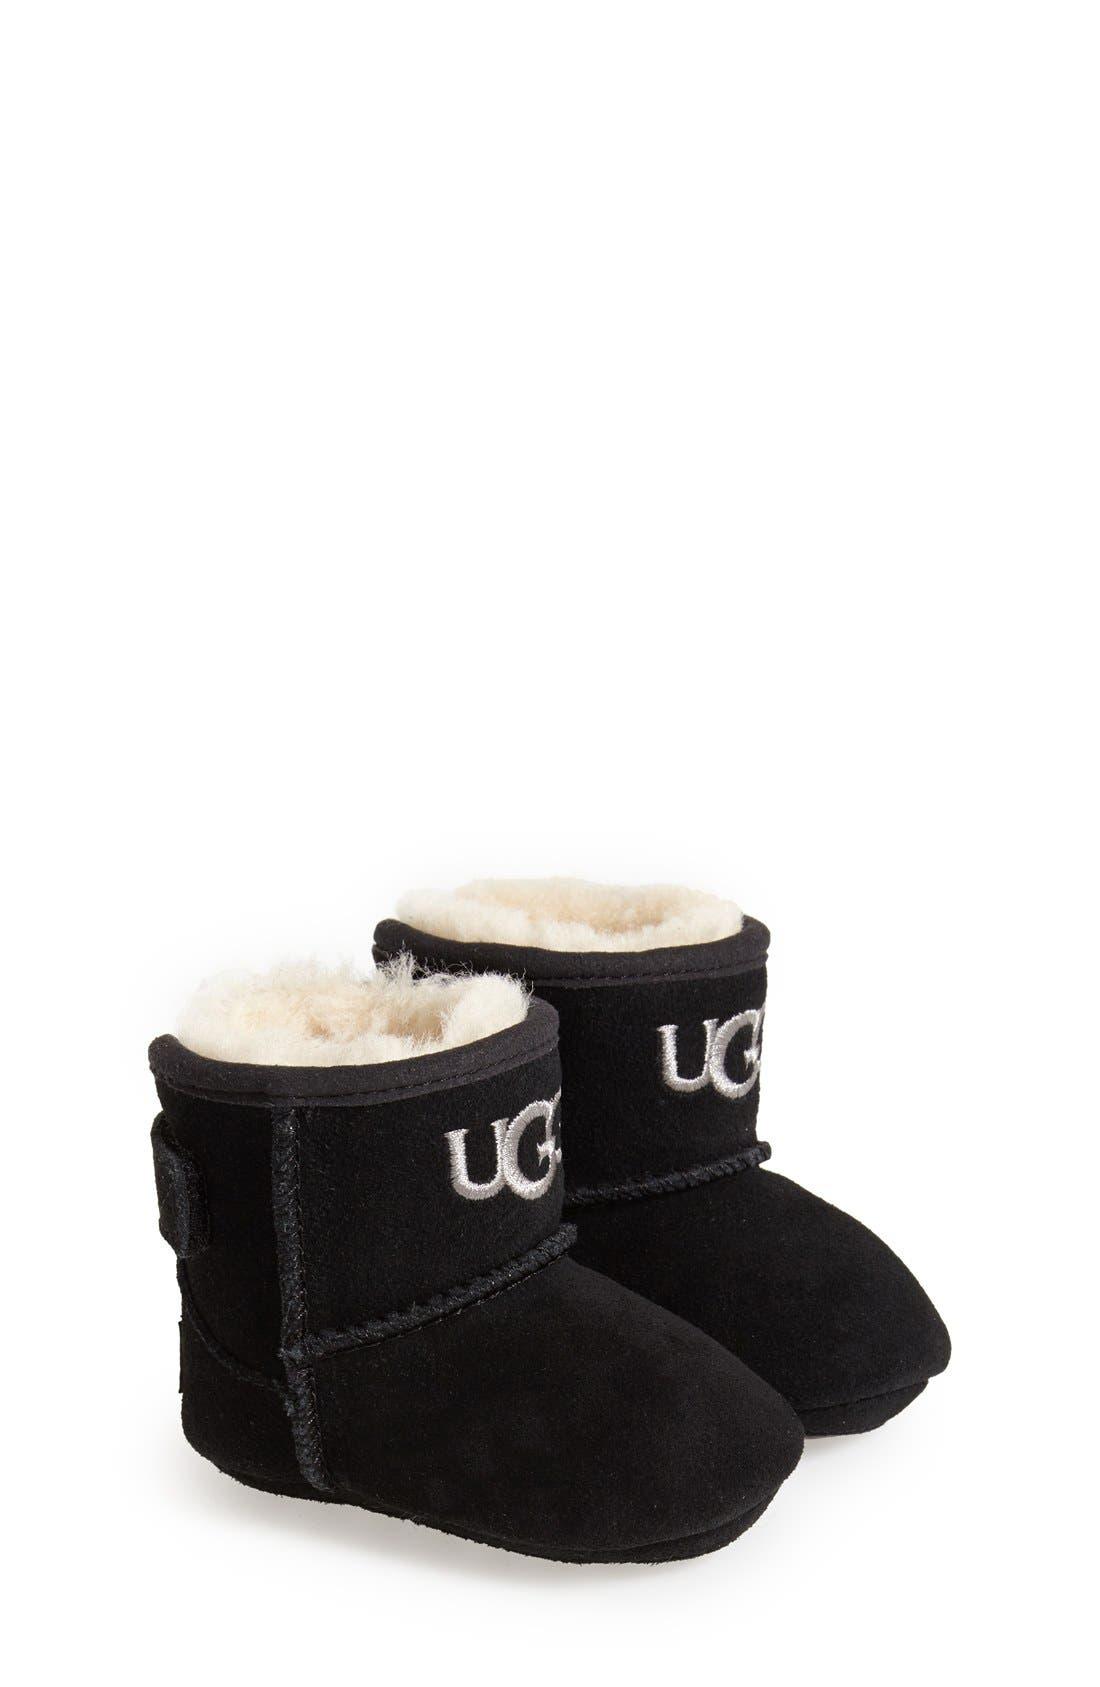 Main Image - UGG® 'Jesse' Suede Boot (Baby & Walker)